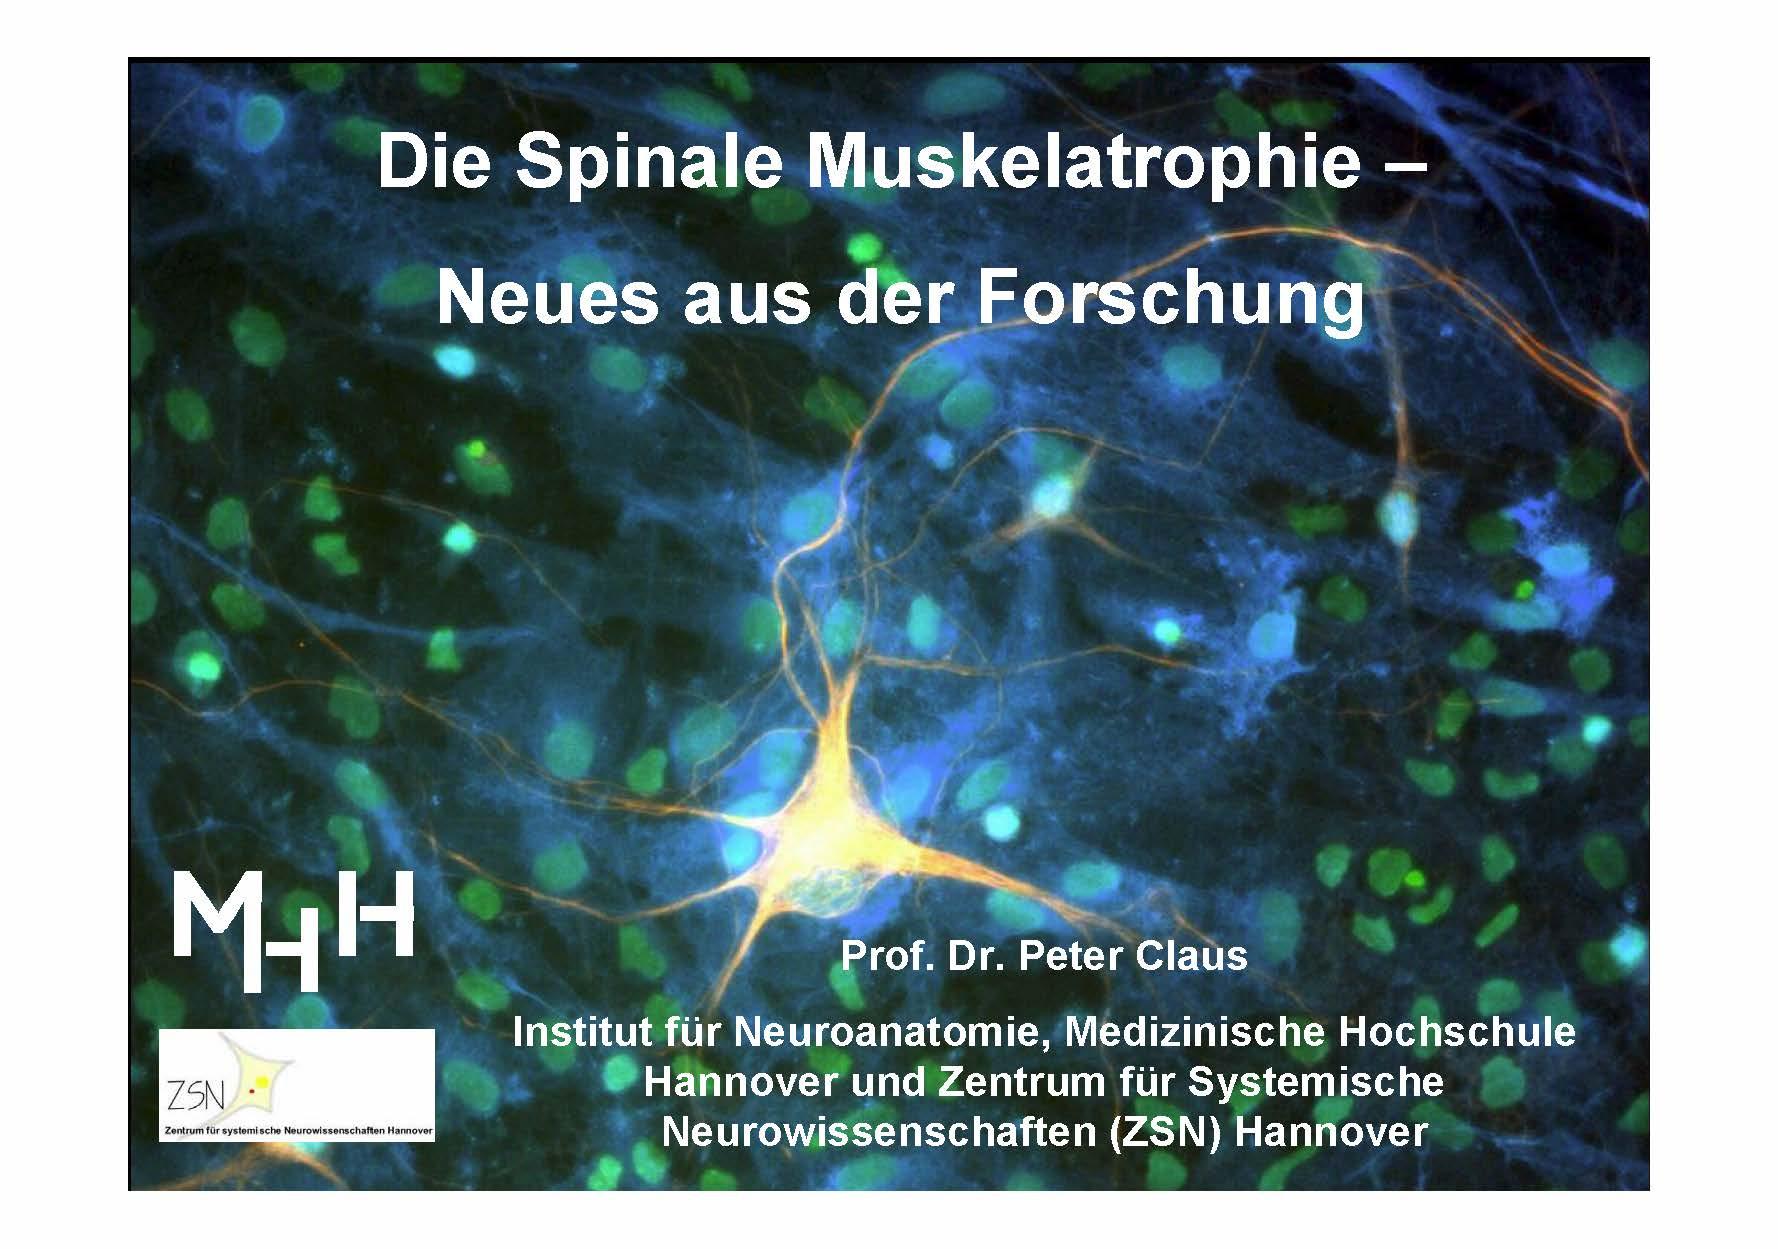 Vortrag Prof. Dr. Peter Claus, MHH, SMA-Treffen Hochwald September 2012